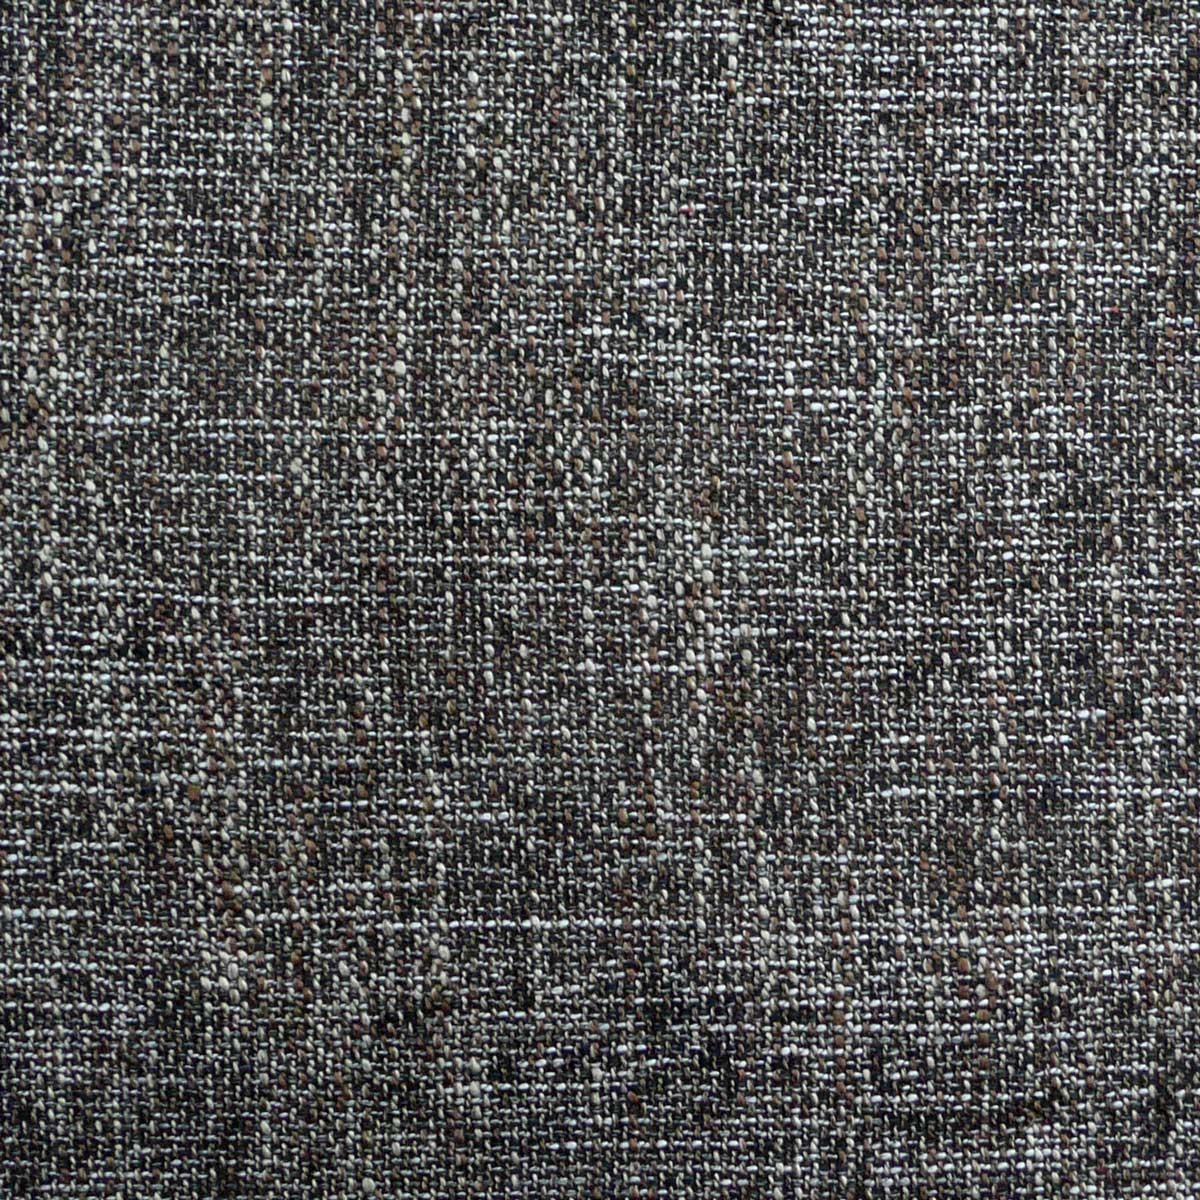 bezugsstoff m belstoff polsterstoff struktur grau braun. Black Bedroom Furniture Sets. Home Design Ideas